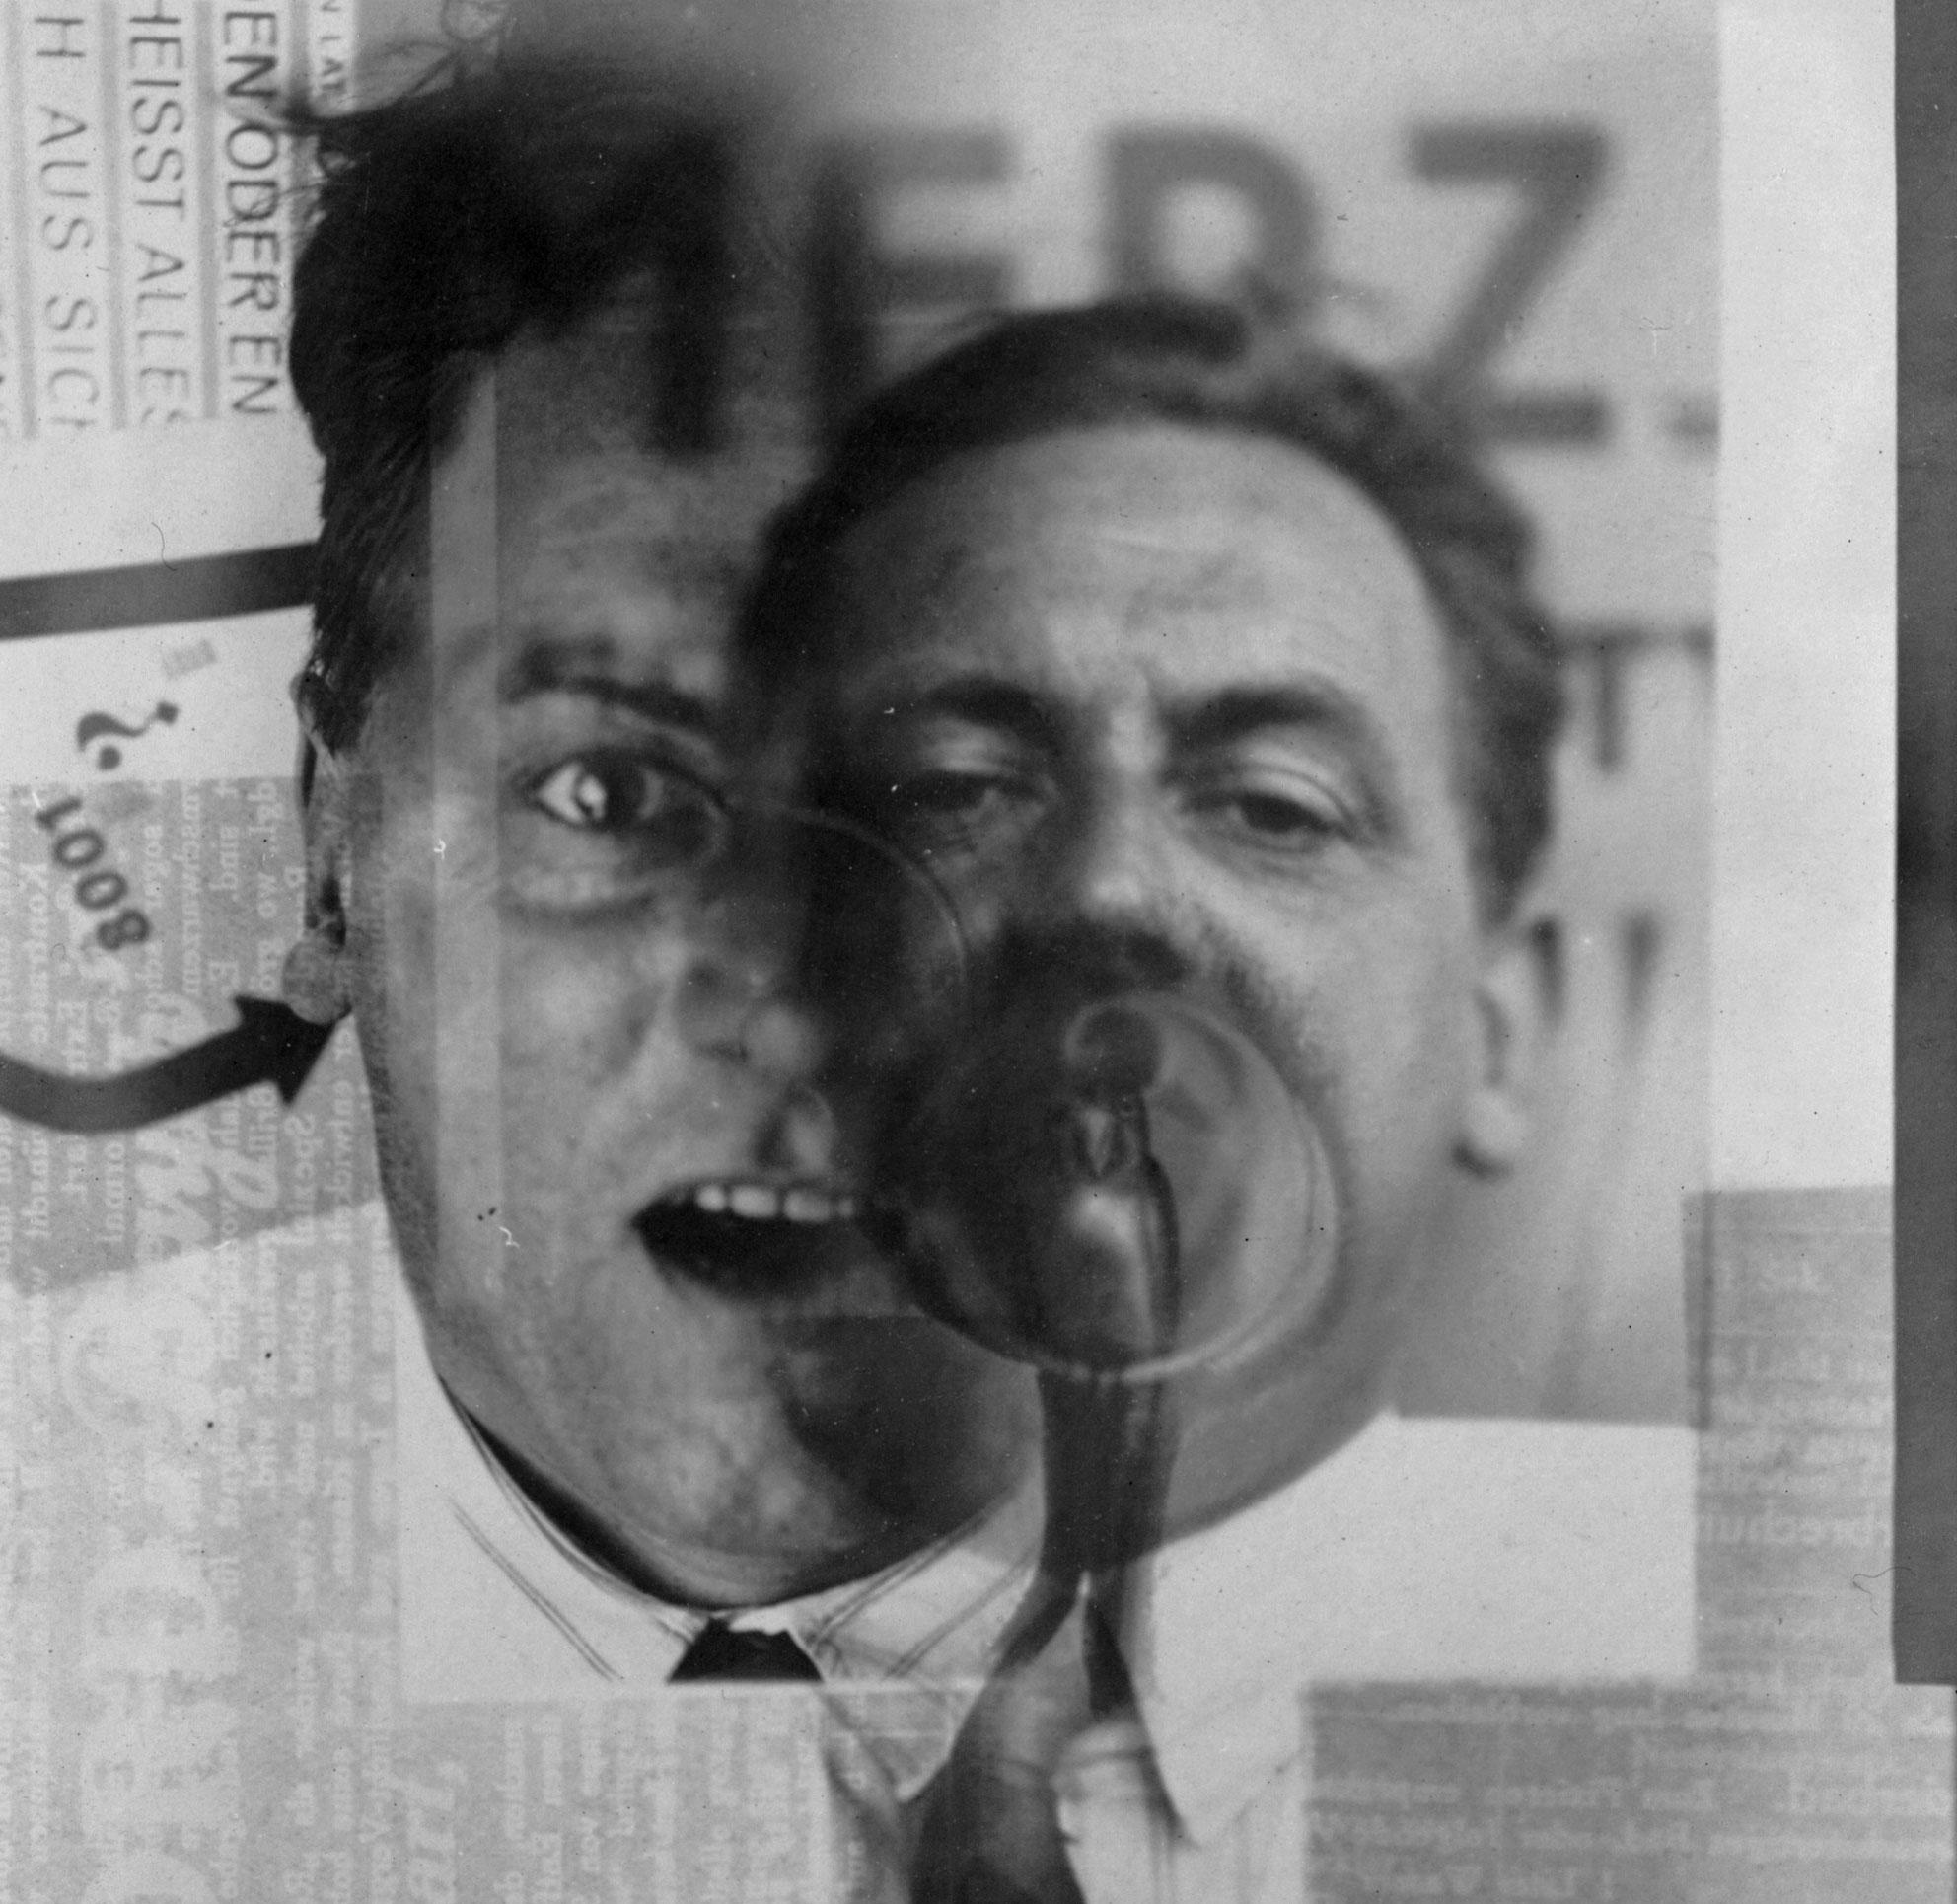 Kurt-Schwitters-DE-portrait-index-grafik.jpg